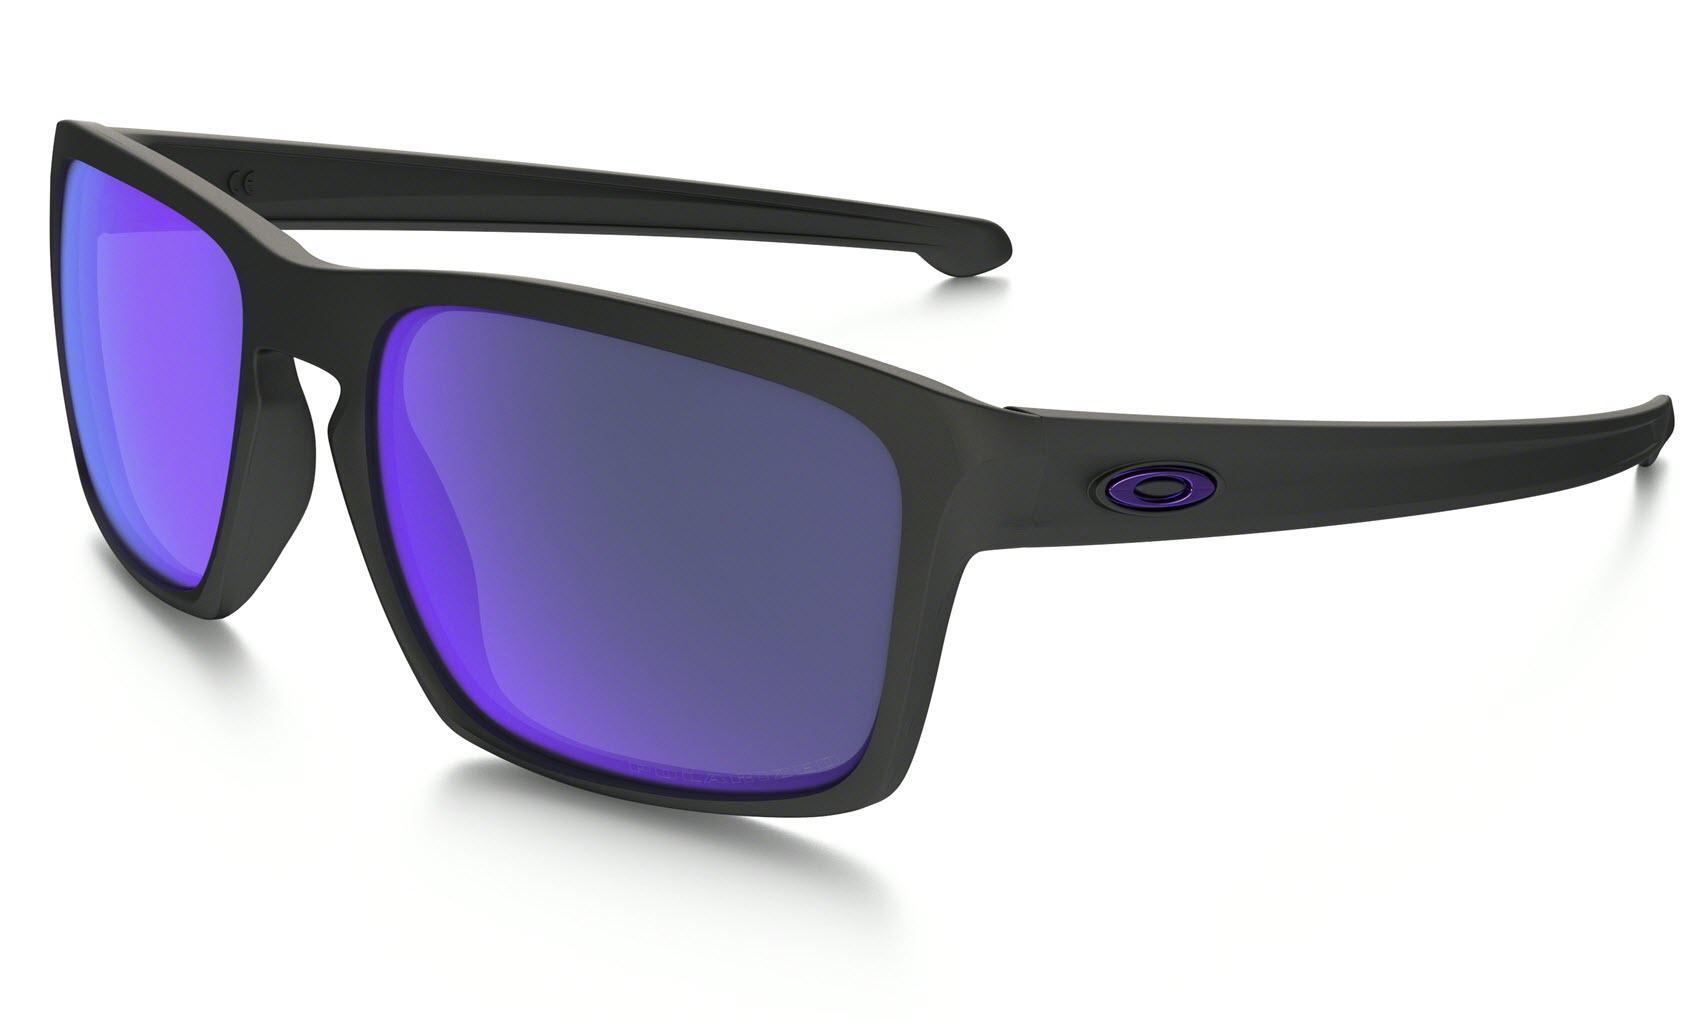 Oakley Sliver Matte Black/Violet Iridium Polarized rJkHOp2